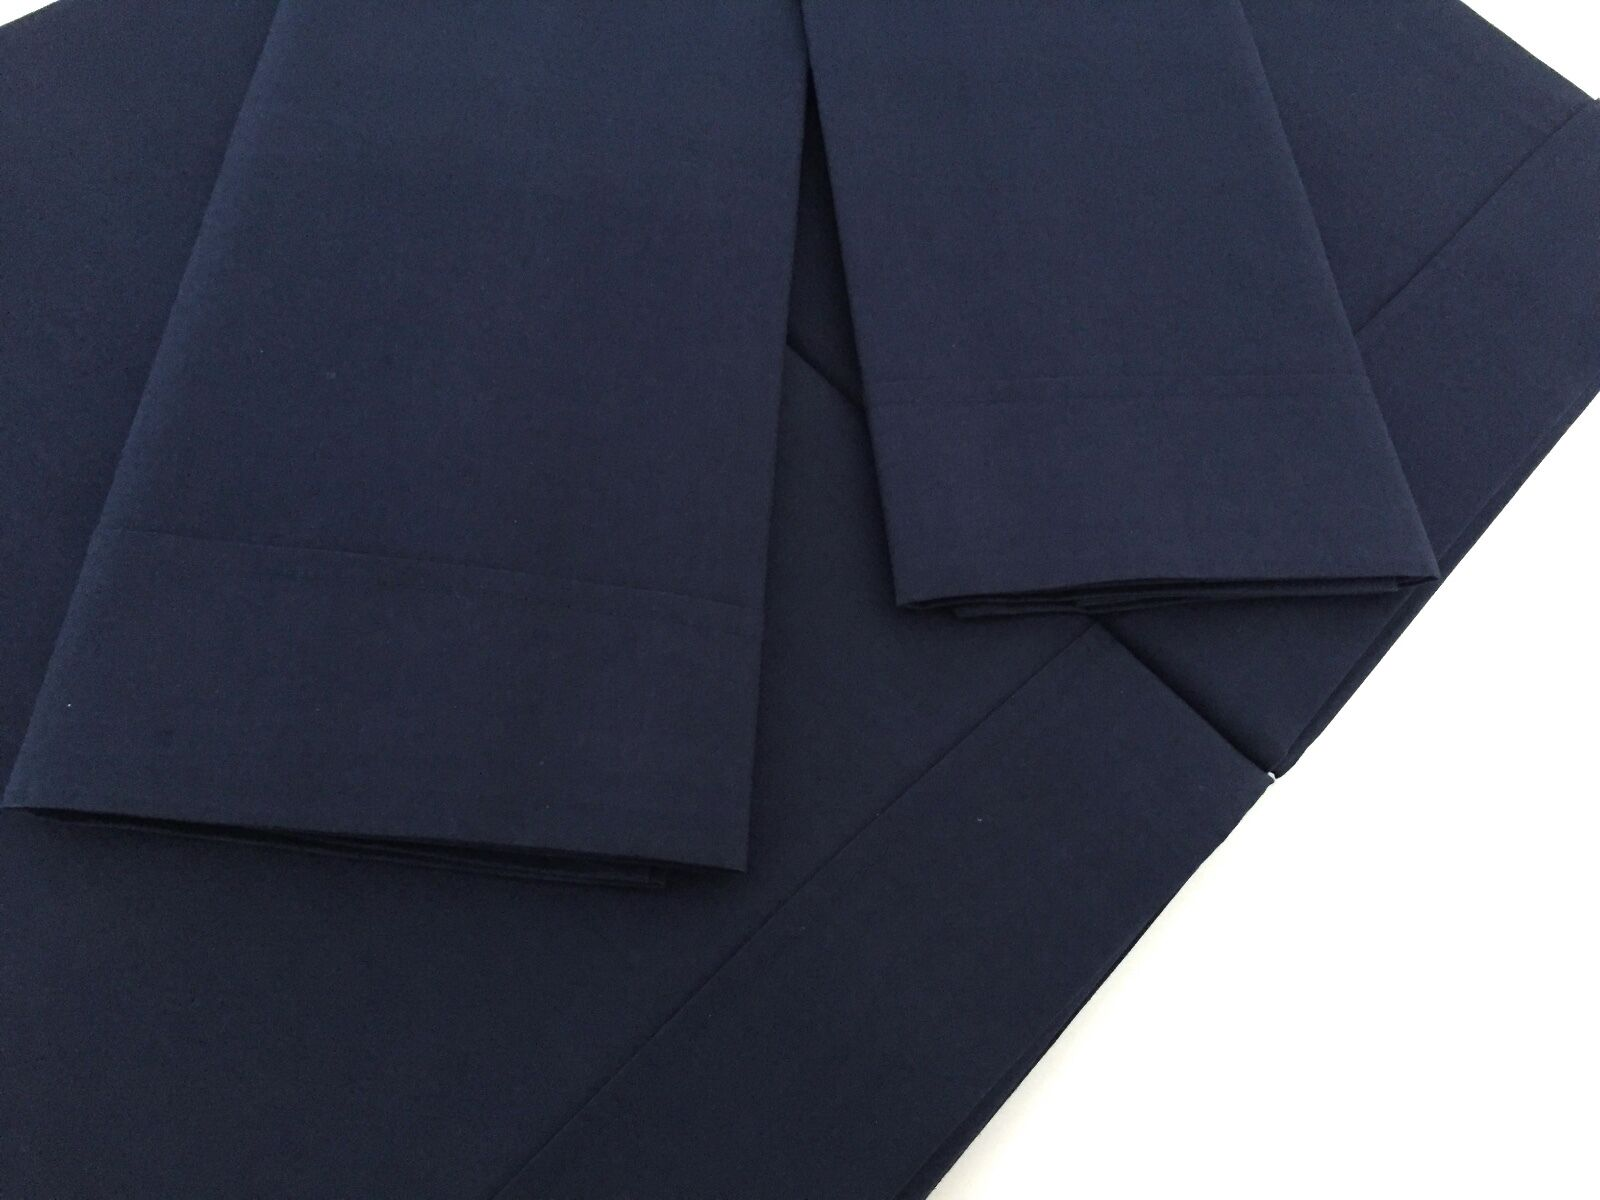 Luxury Italian 100% Egyptian Cot Percale King Sz Bed Set Sheets Midnight blueeee